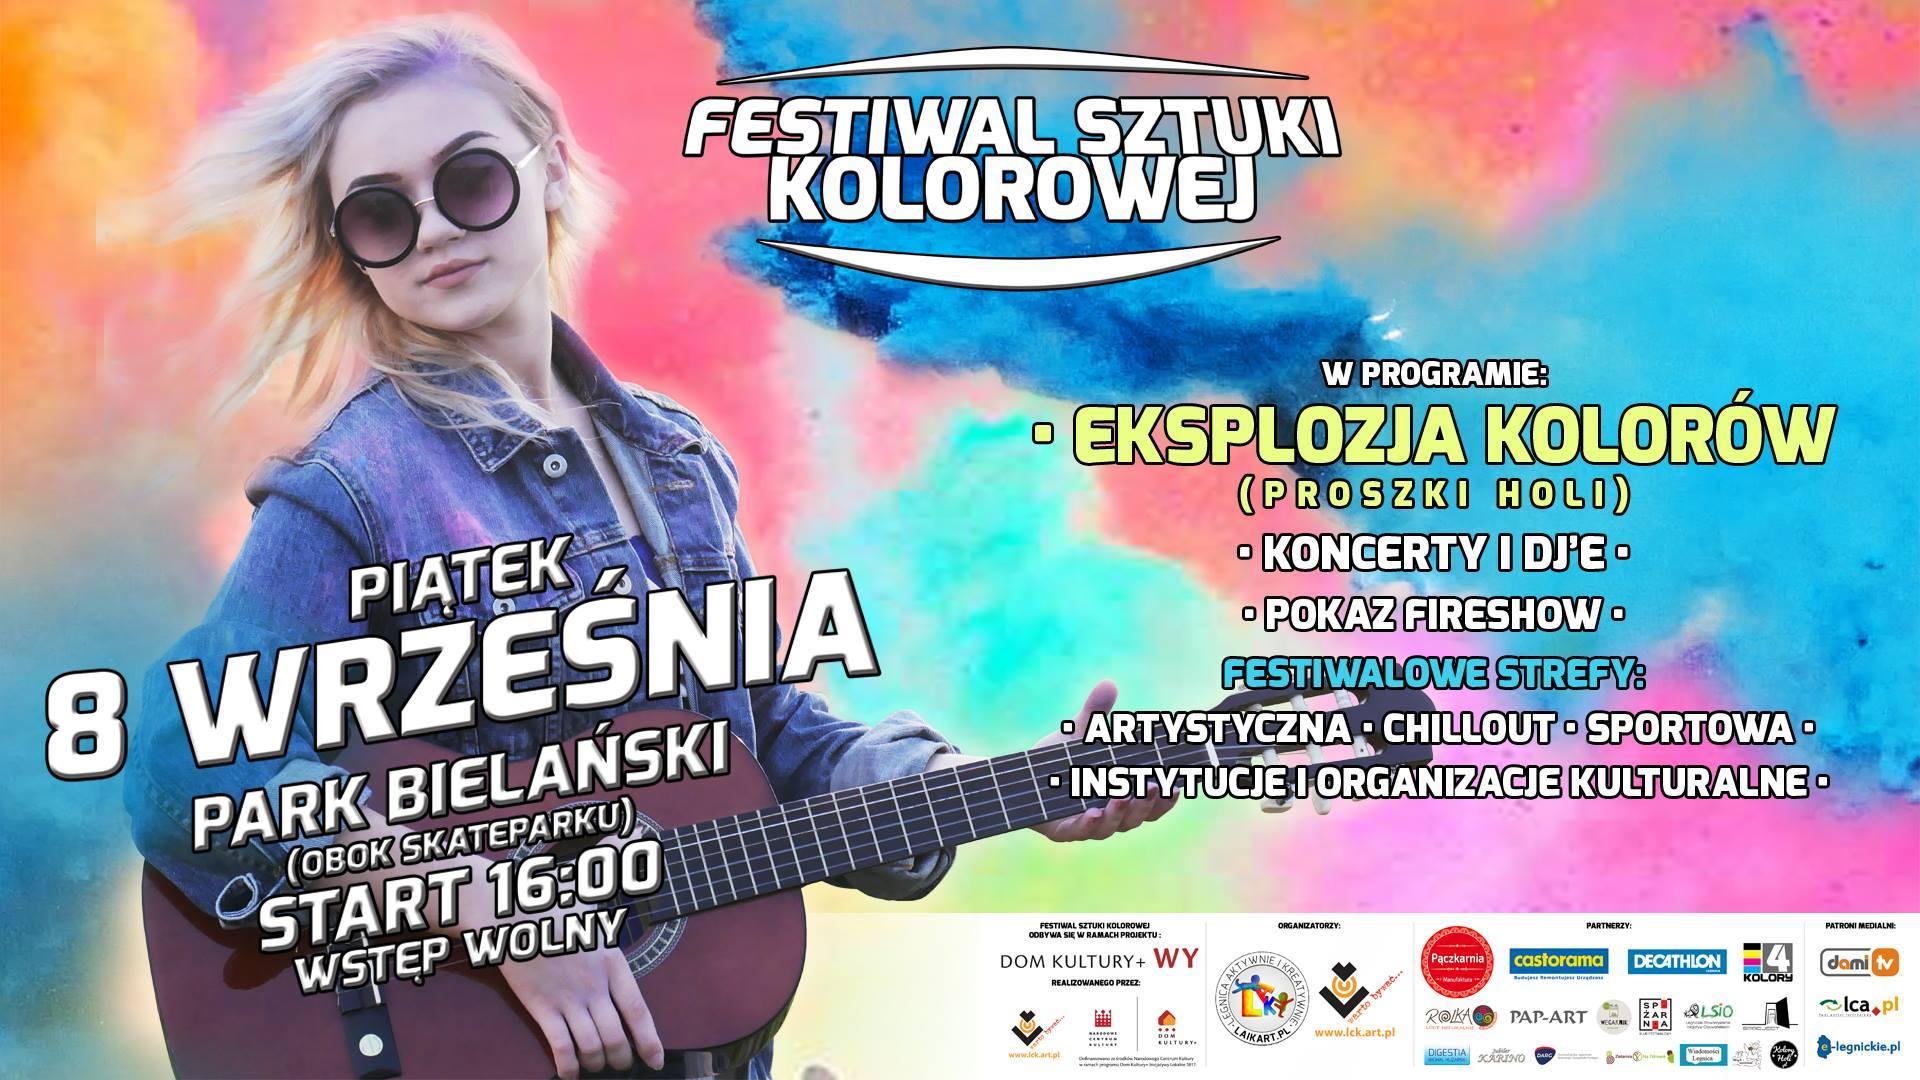 Festiwal Sztuki Kolorowej już w piątek w Legnicy!